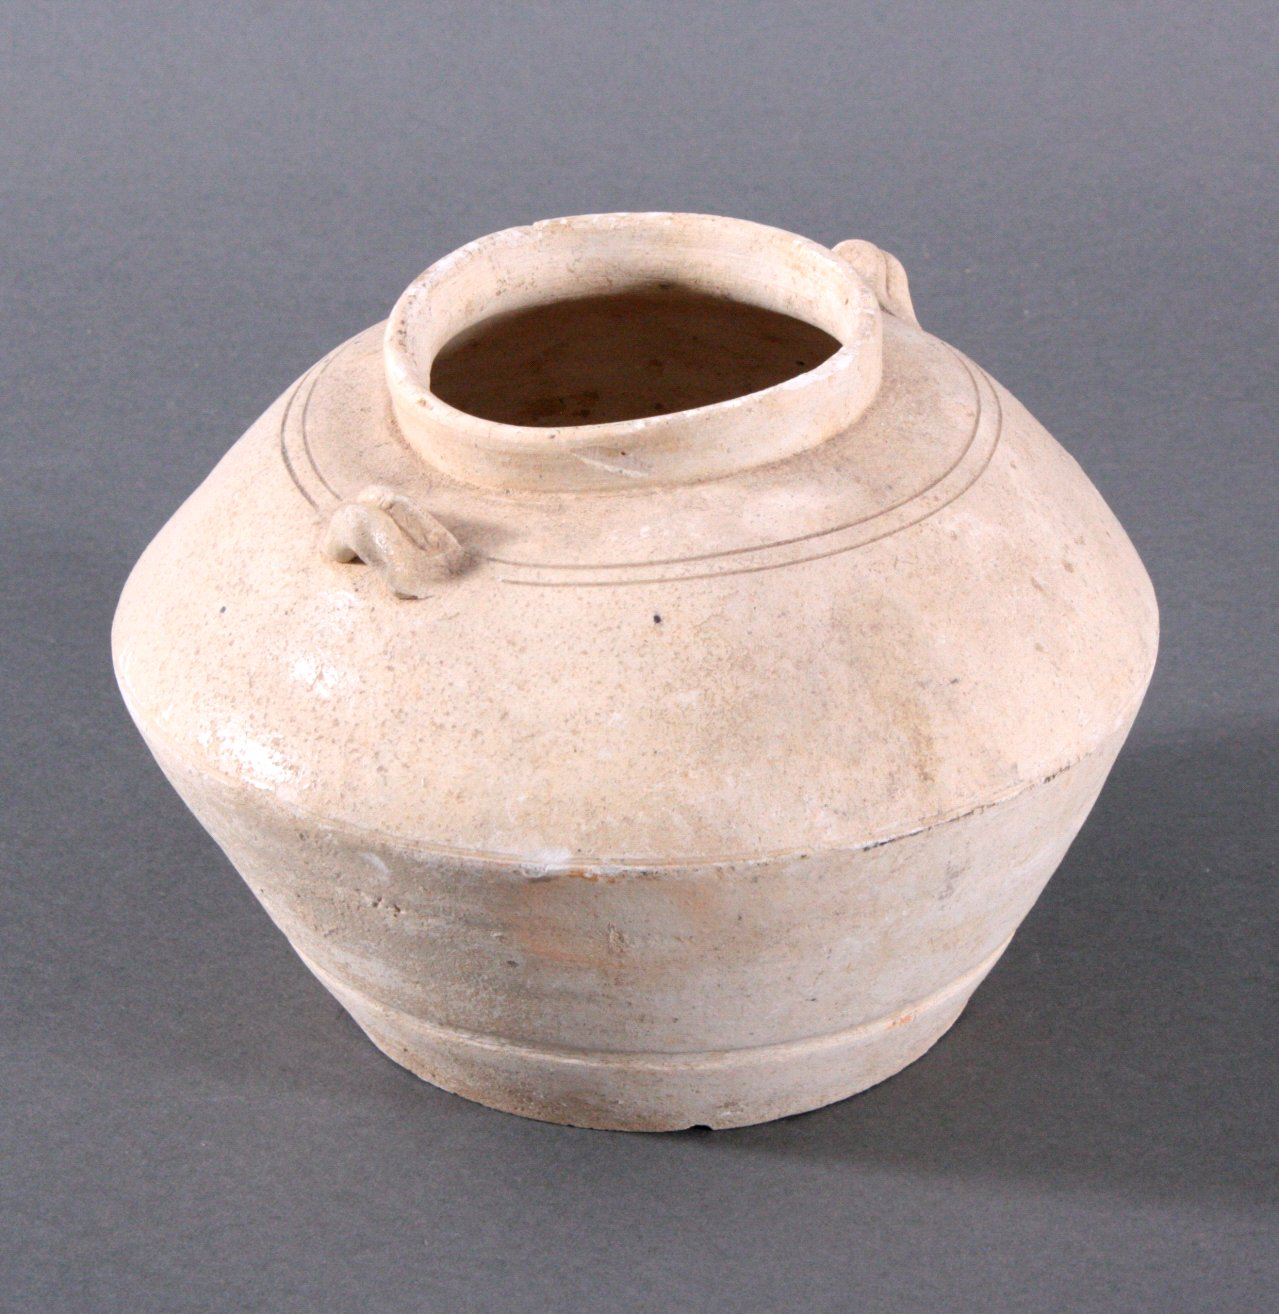 Rundes Vorratsgefäß, Angkor-Periode 12./13. Jh.-1